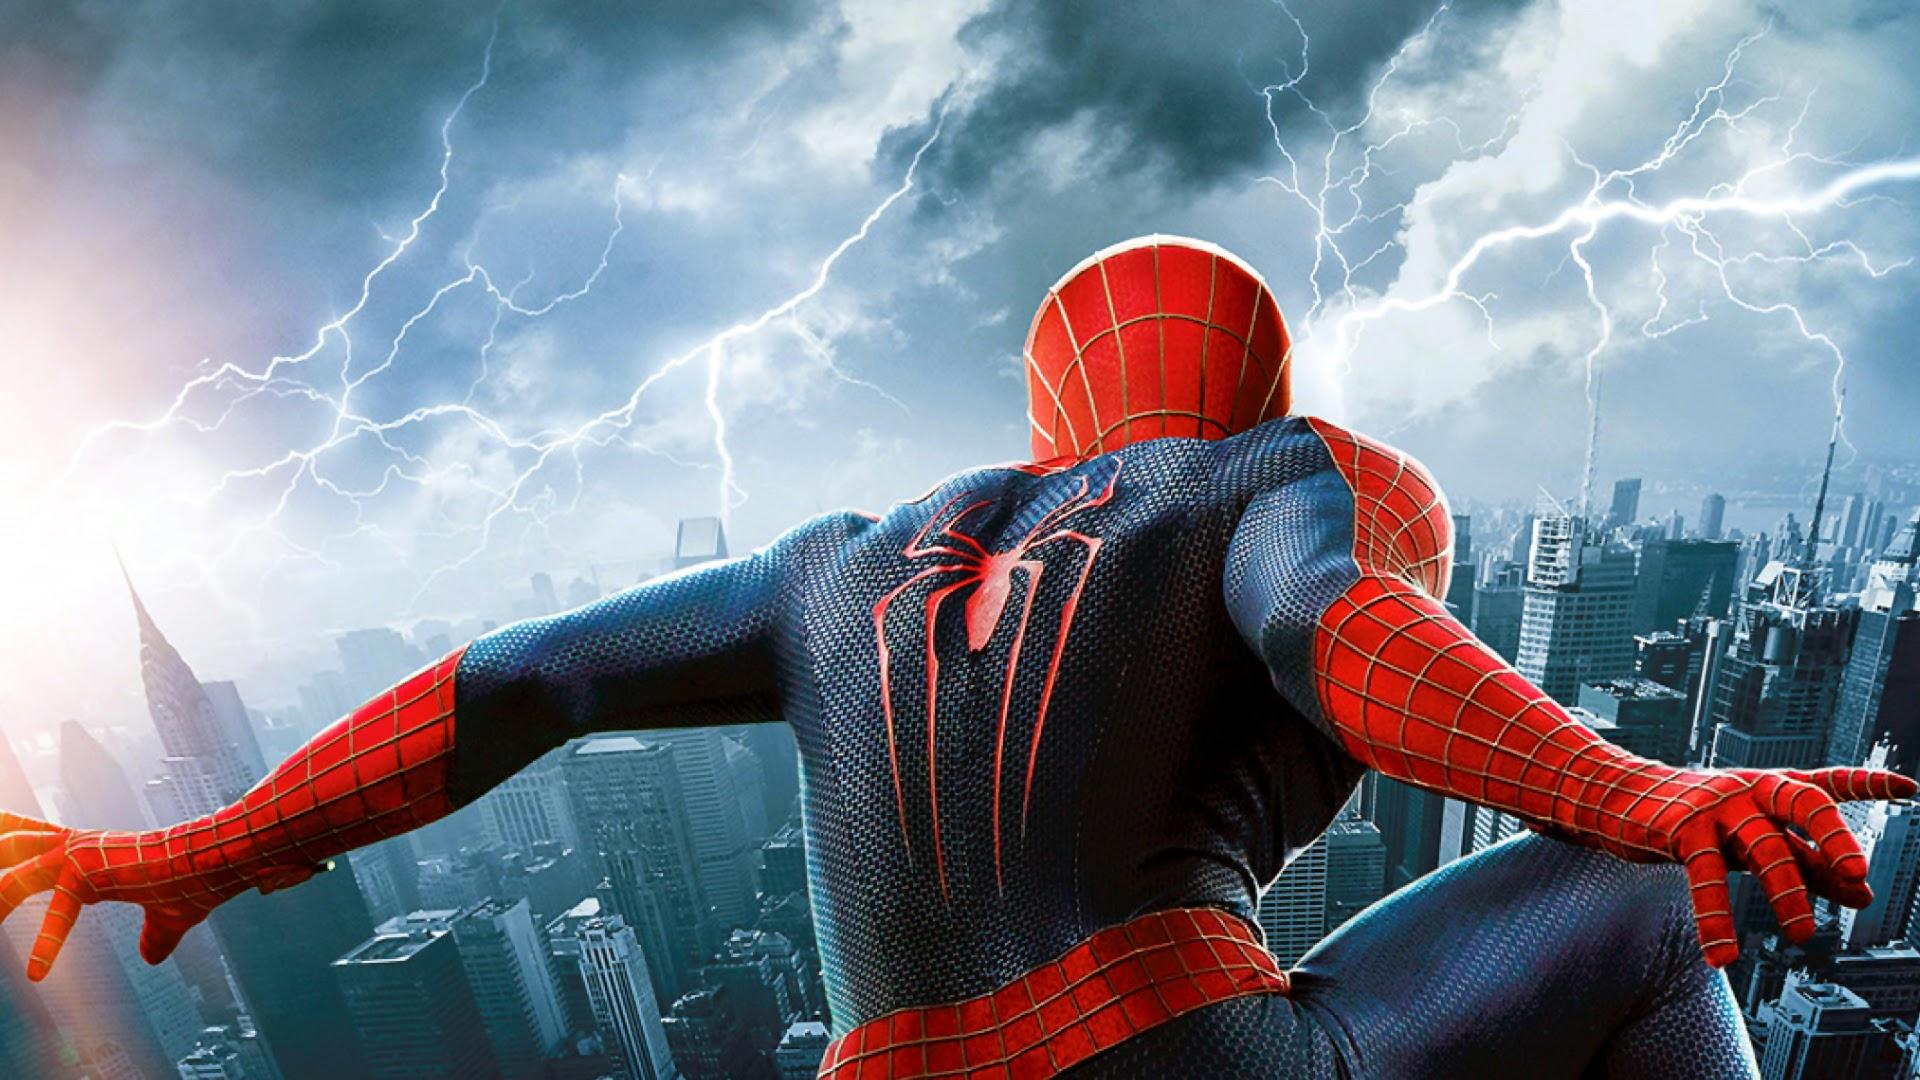 the amazing spider man 2 2014 movie hd wallpaper 1920x1080 3g 1920x1080